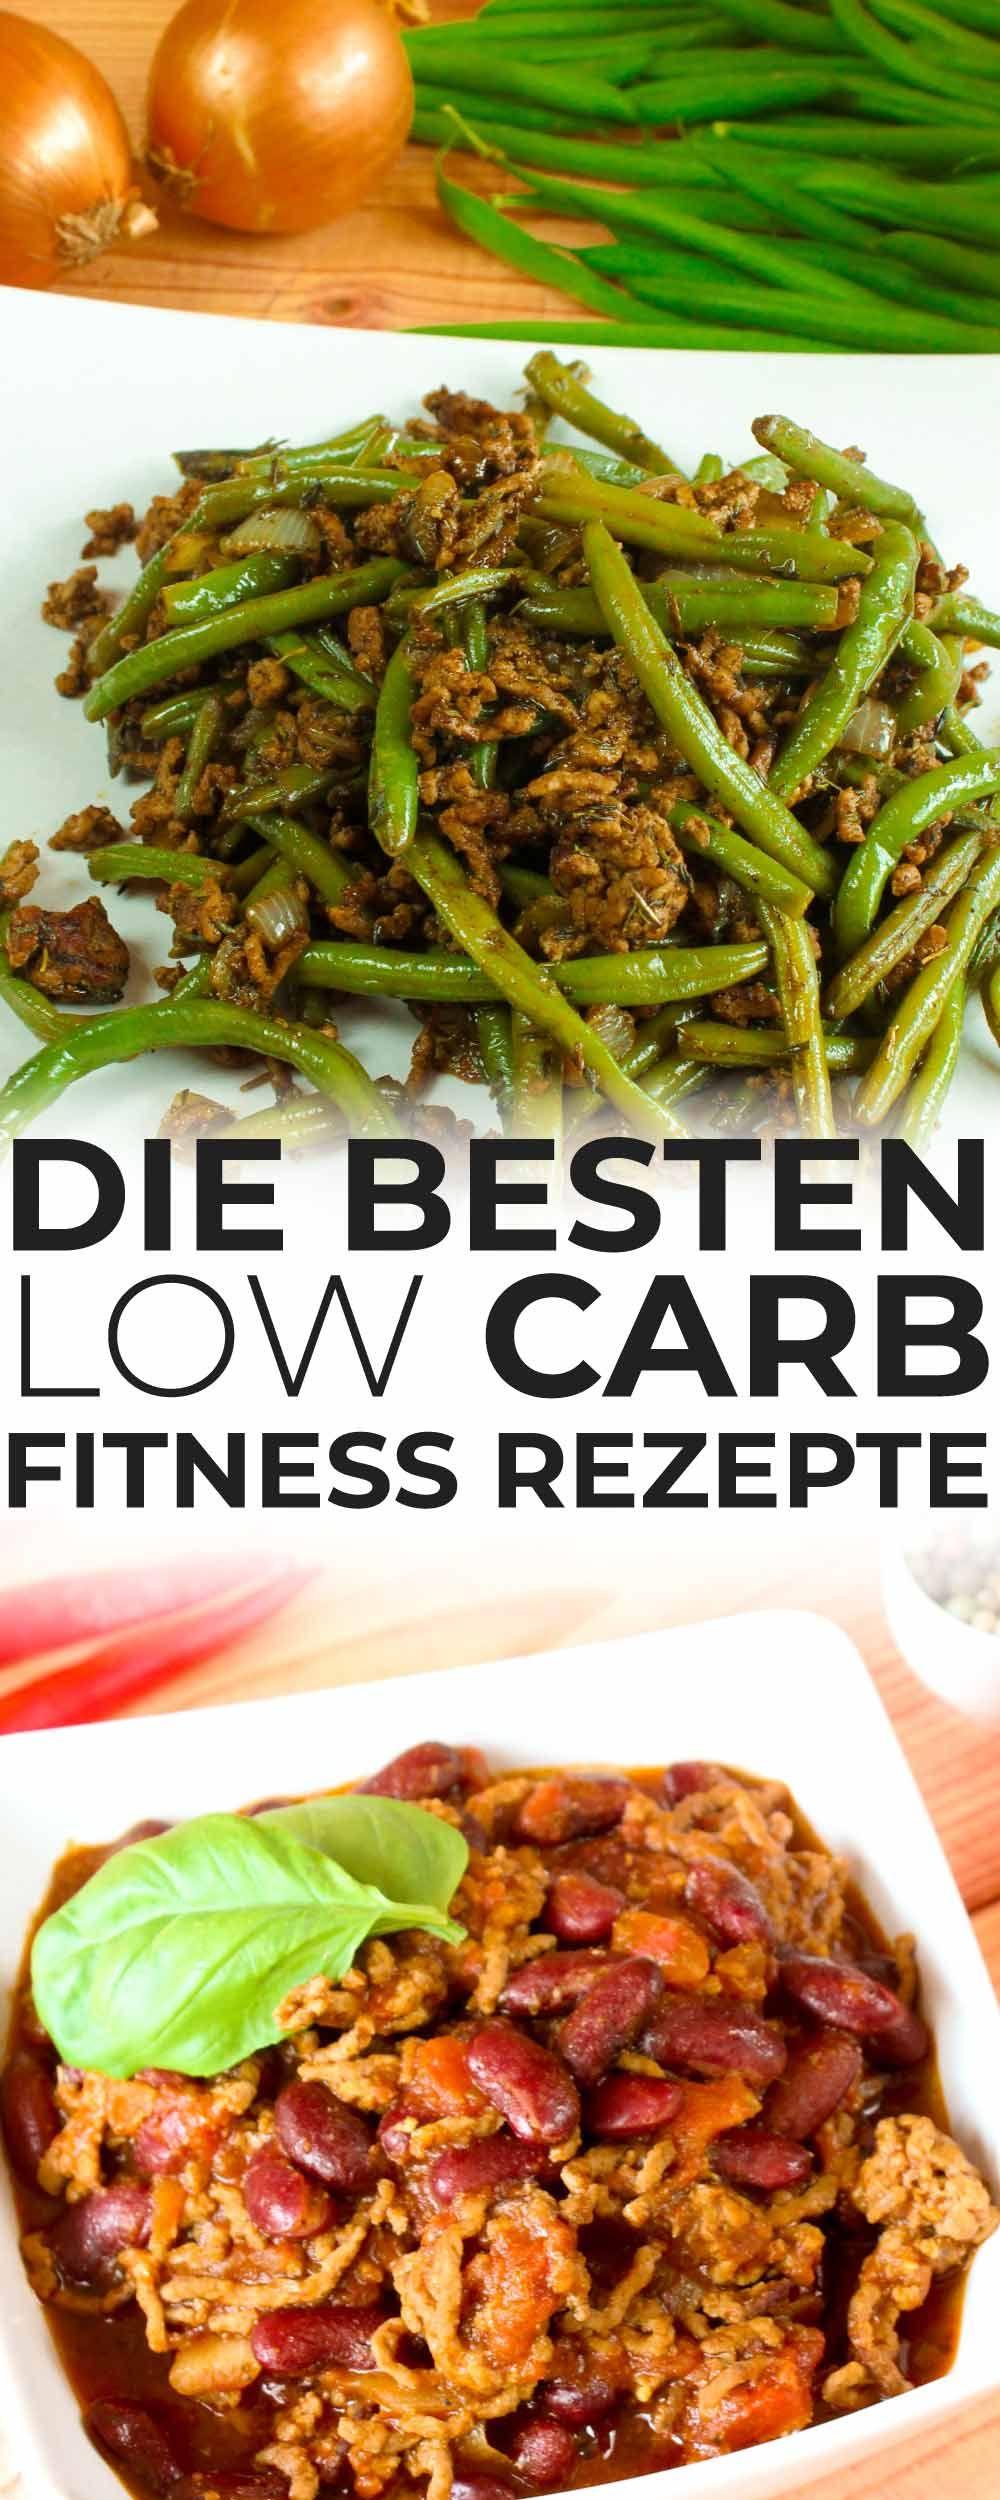 Die Besten Low Carb Fitness Rezepte Fitness Lebensmittel Rezepte Abnehmen Rezepte Muskelaufbau